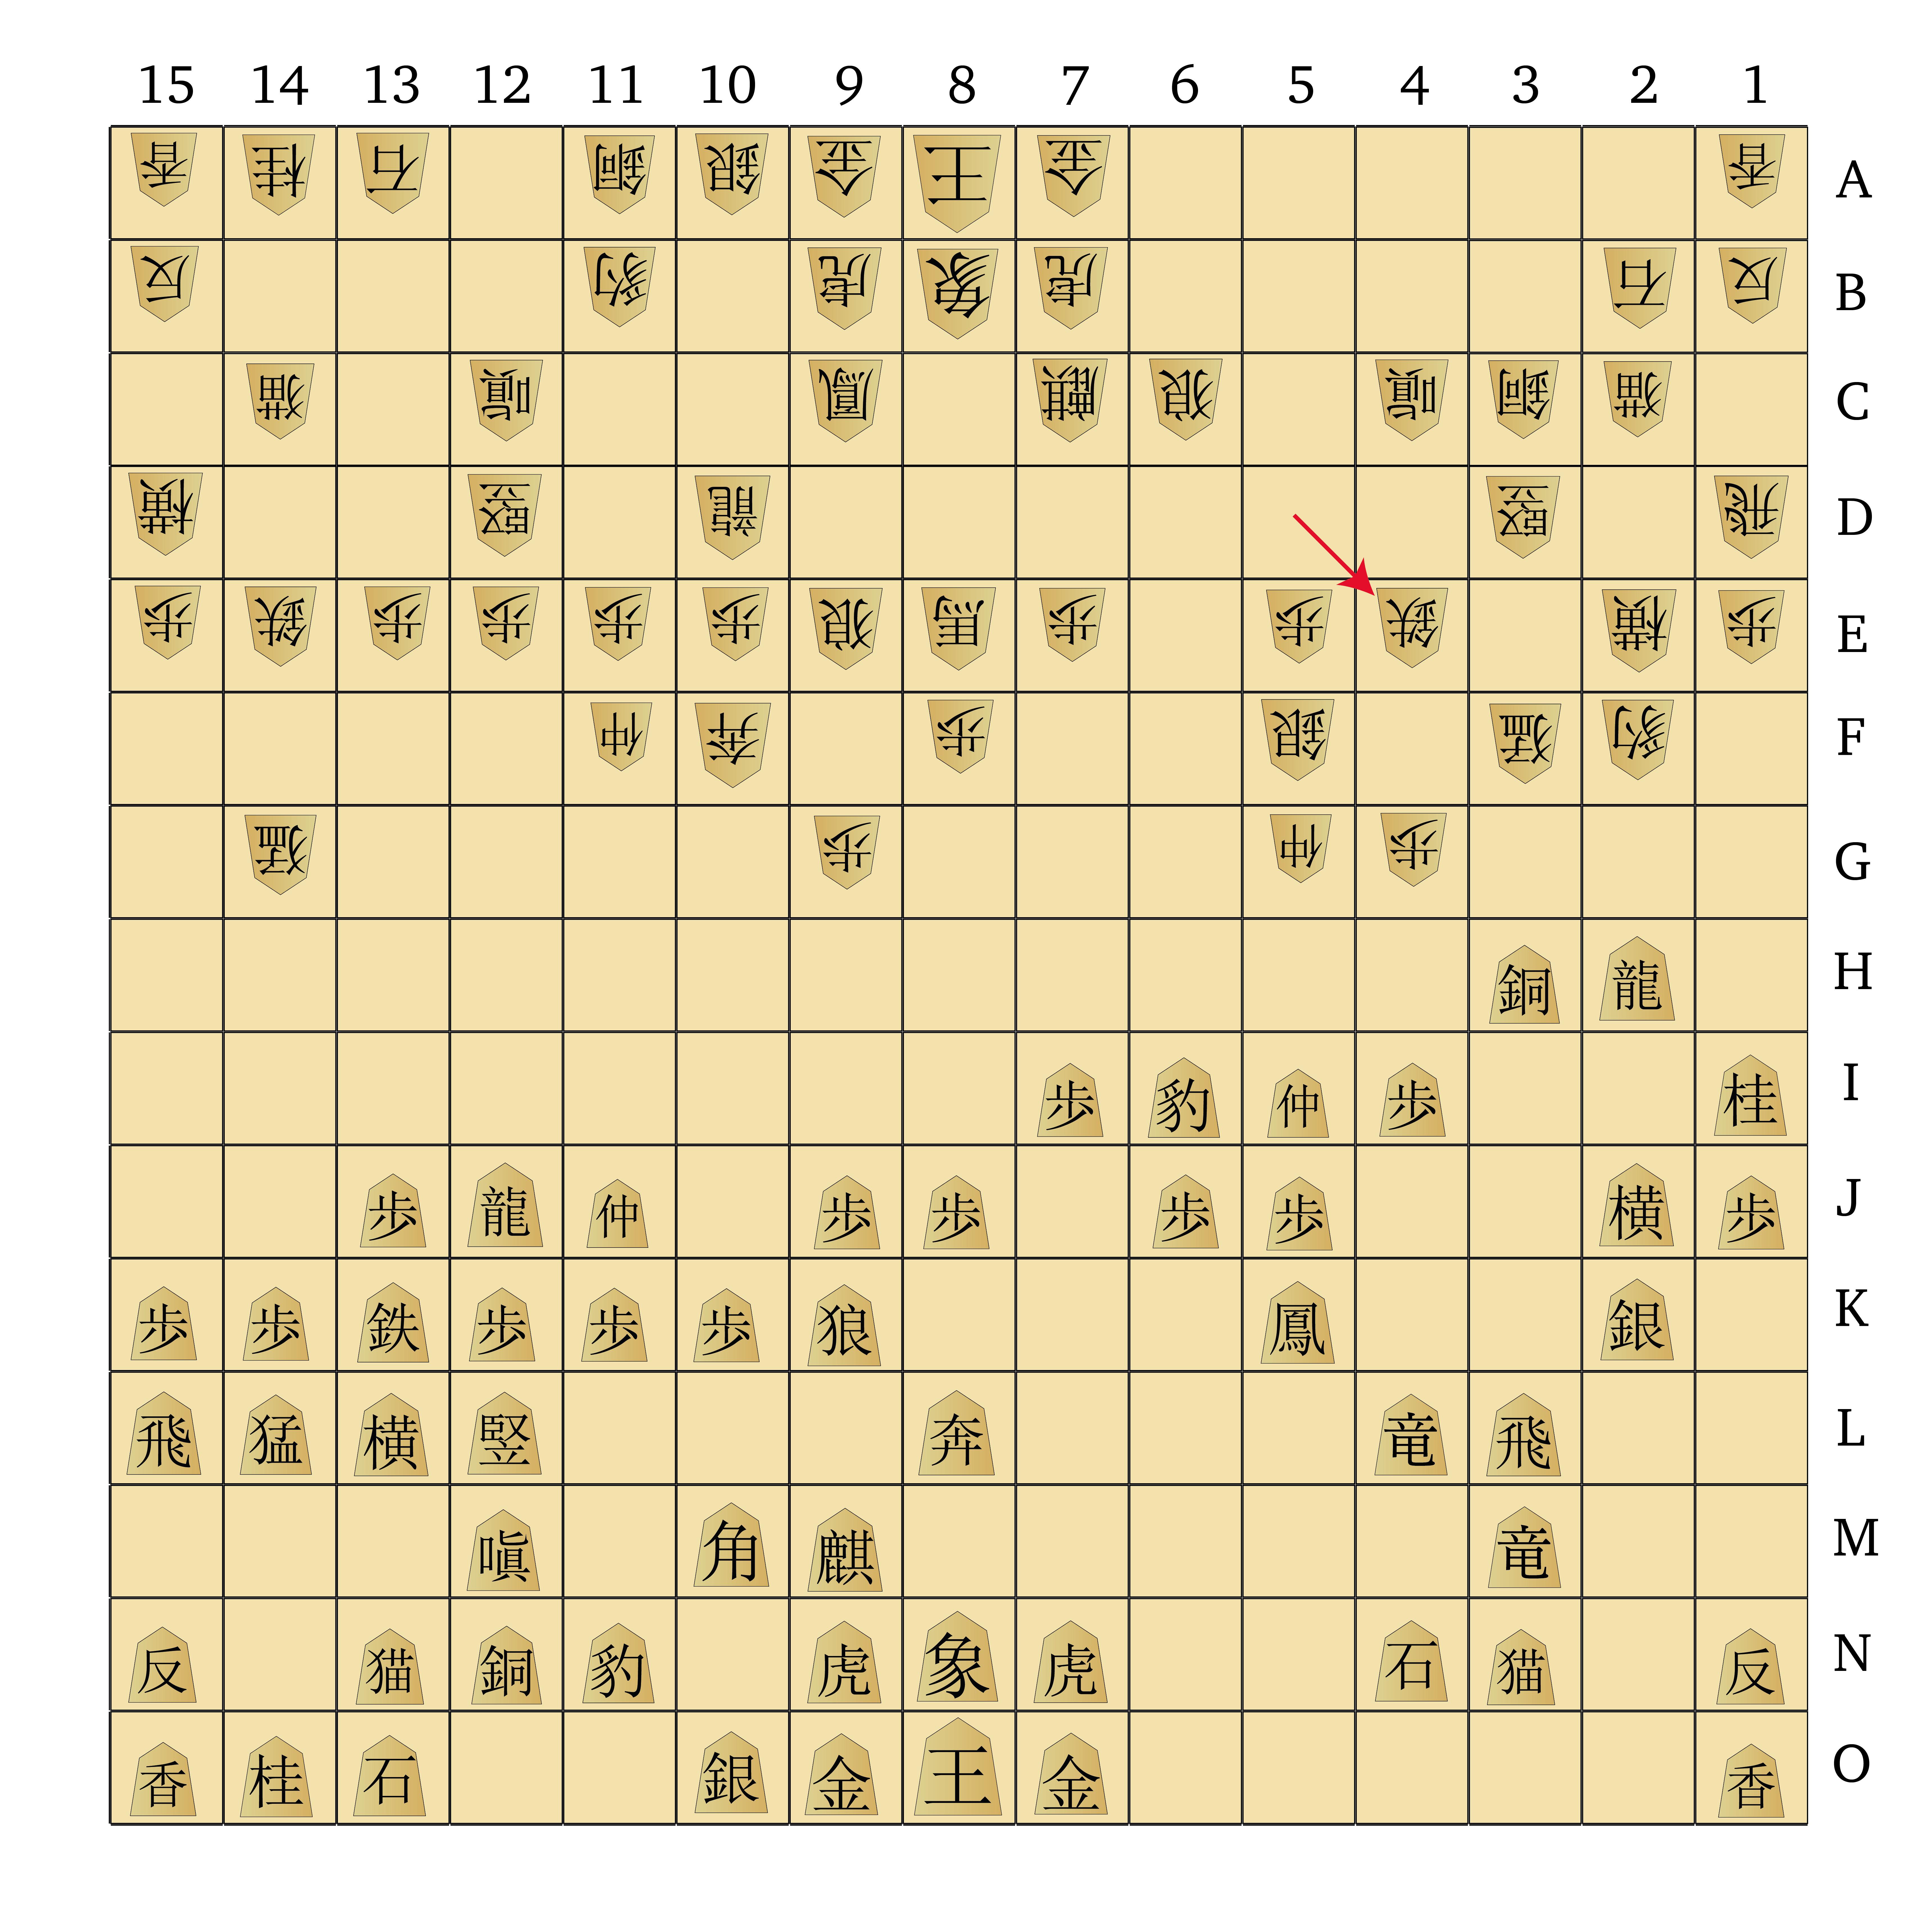 Dai Shogi 420 -- Move 180-01